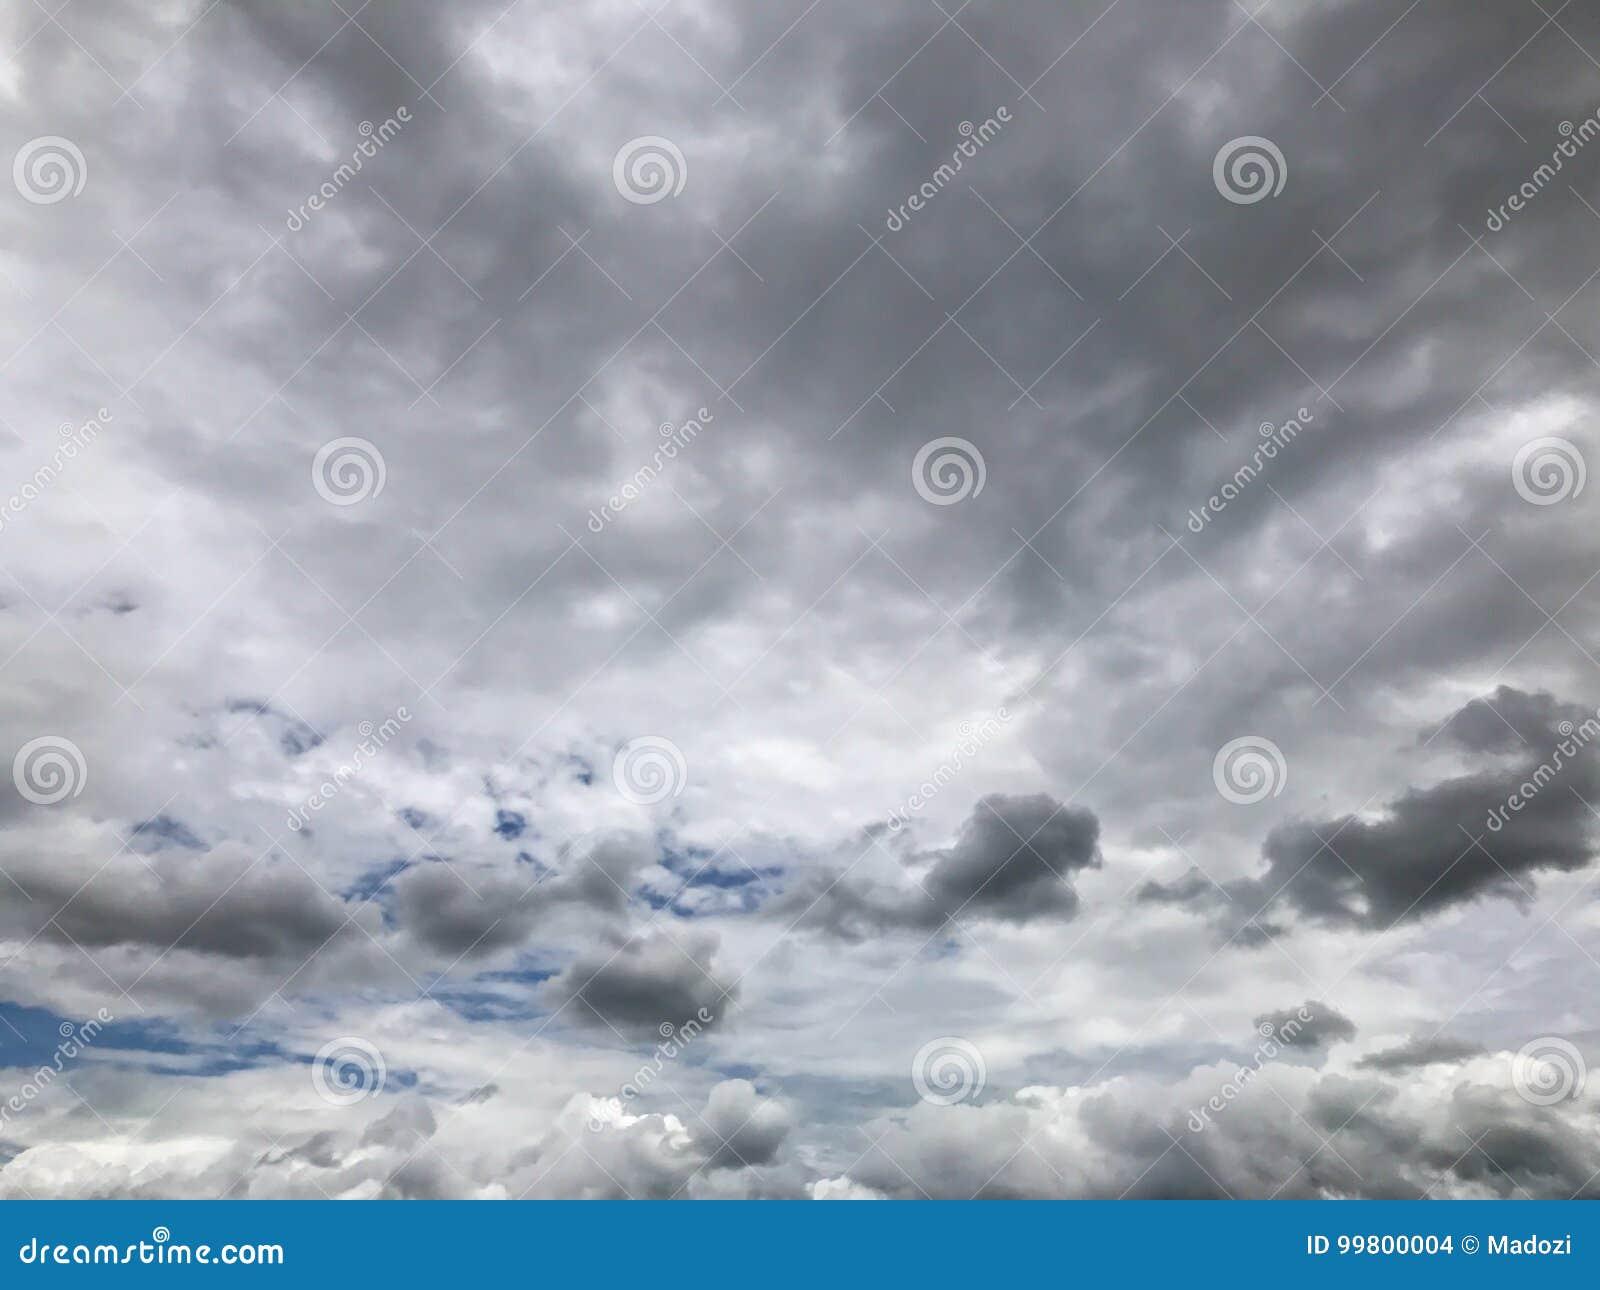 nimbus clouds dark ominous sky stock photo image of frame rain